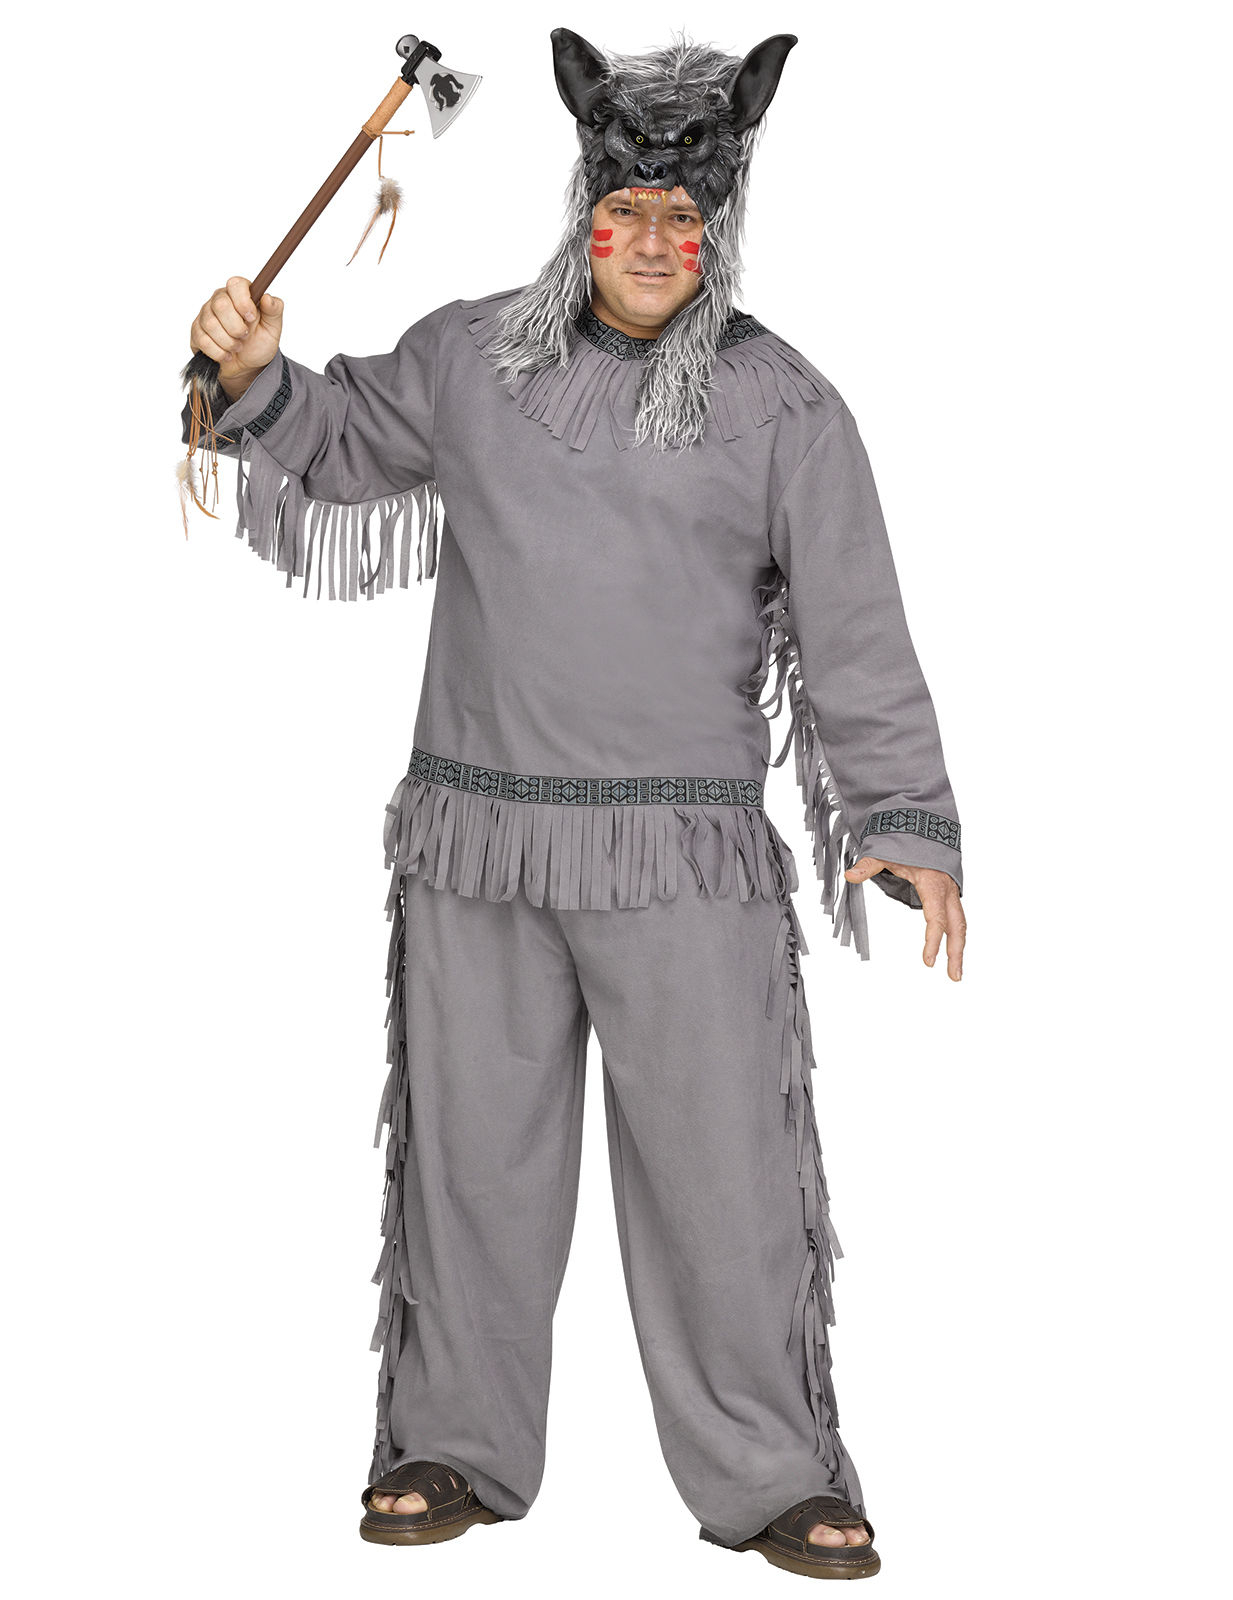 indianer werwolf herrenkost m grau kost me f r erwachsene und g nstige faschingskost me vegaoo. Black Bedroom Furniture Sets. Home Design Ideas